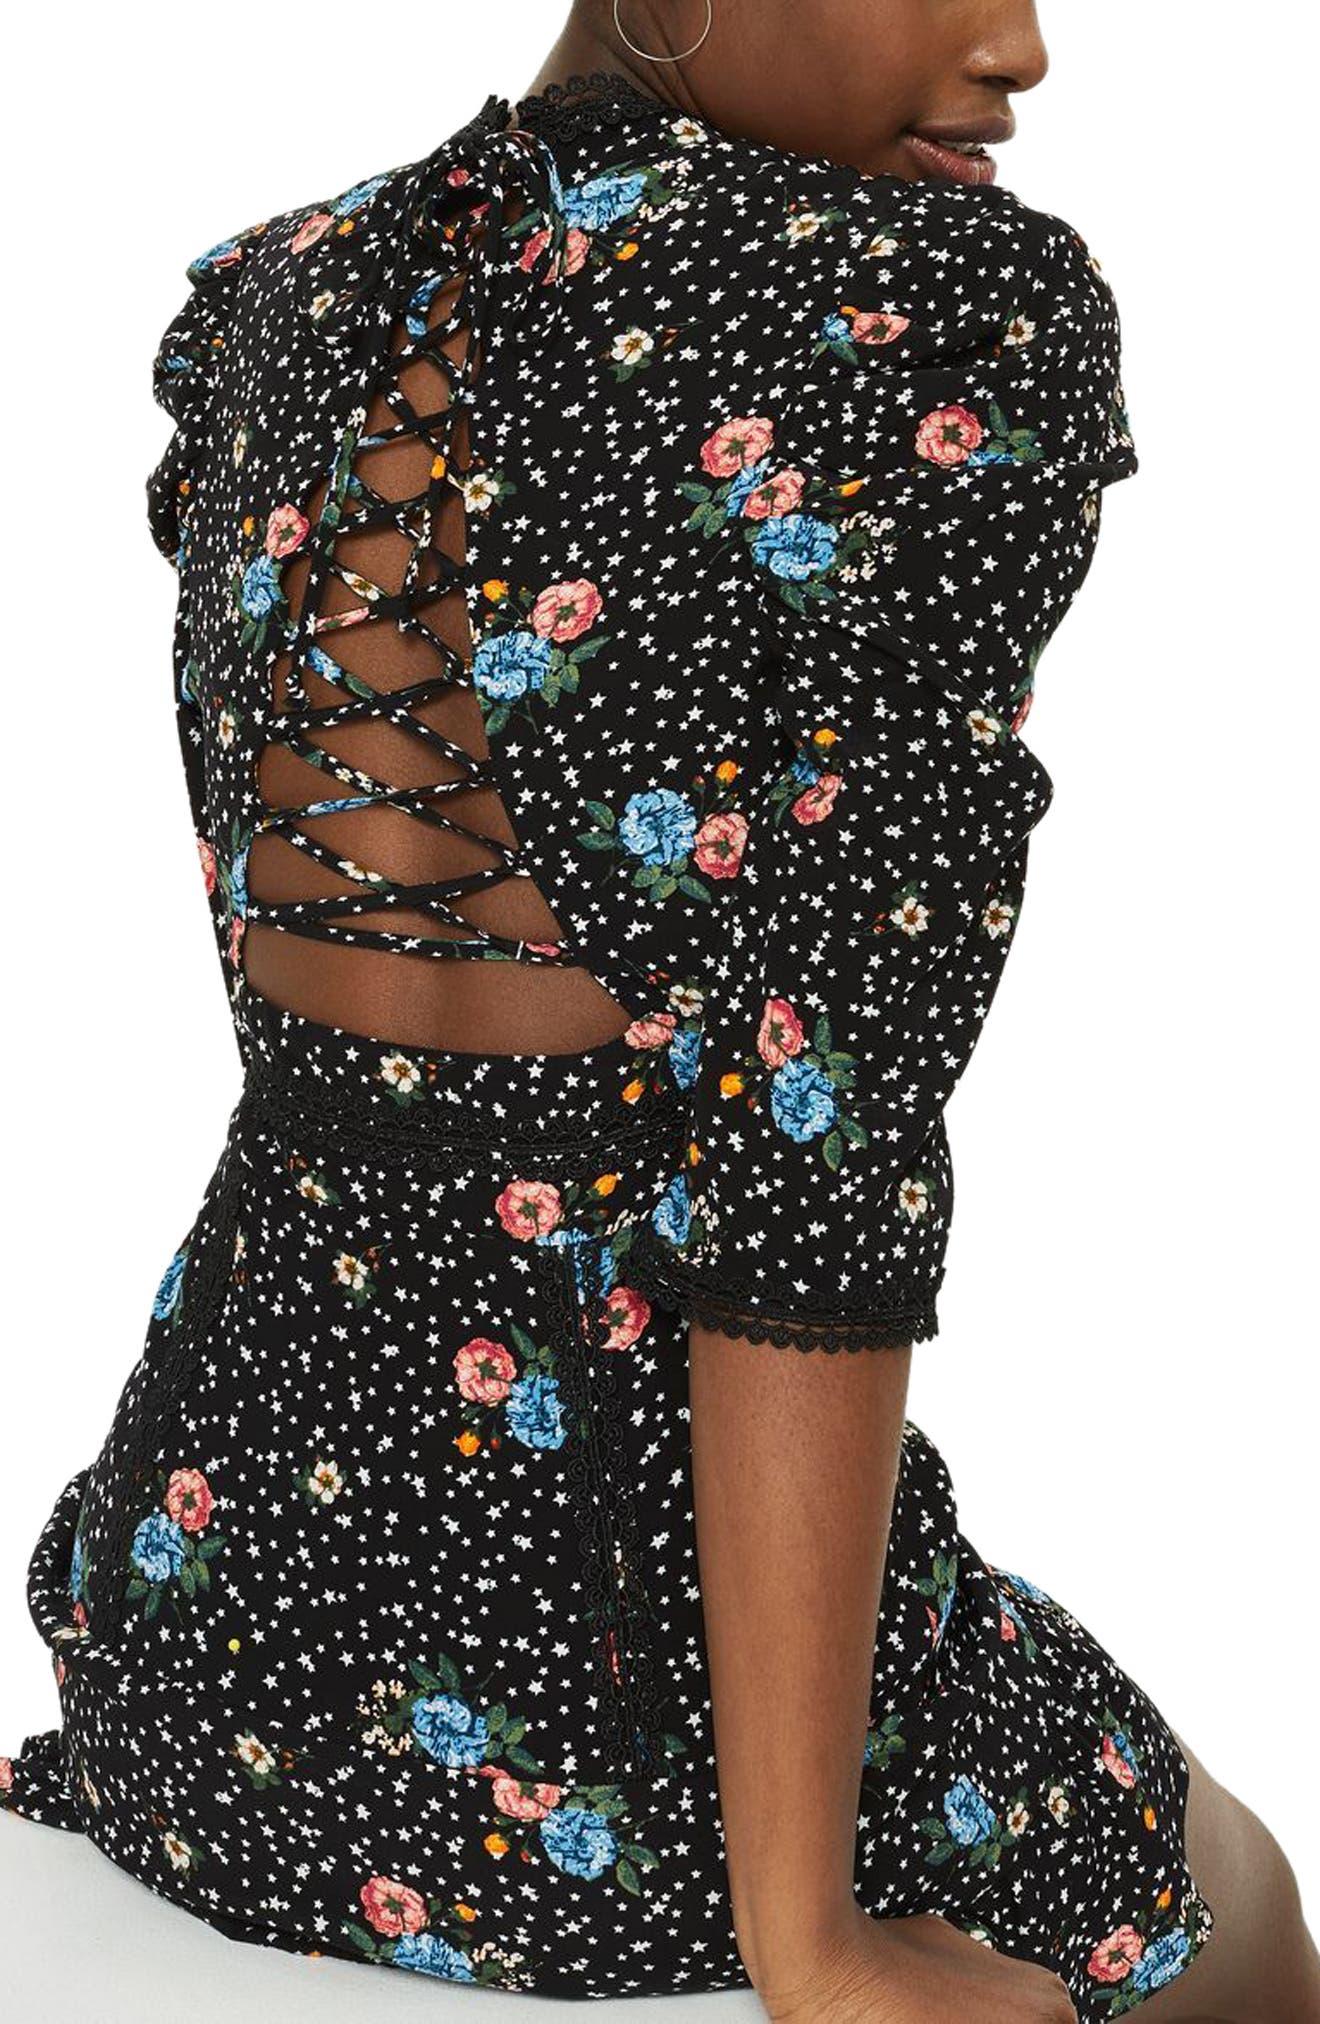 Lace-Up Back Floral Dress,                             Alternate thumbnail 2, color,                             Black Multi